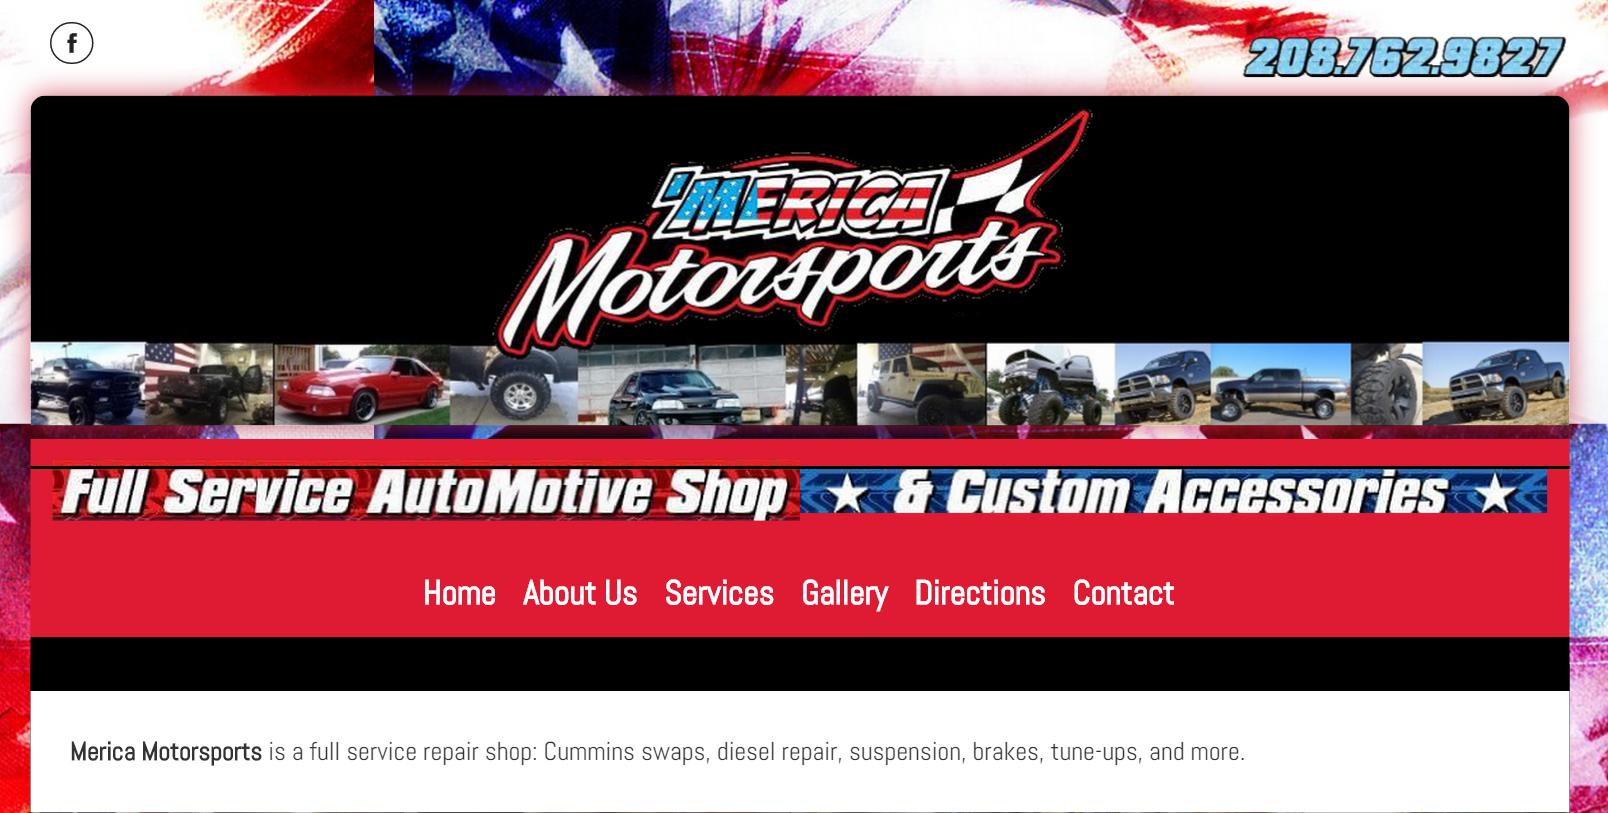 Merica Motorsports Website Design by SkyPoint Studios